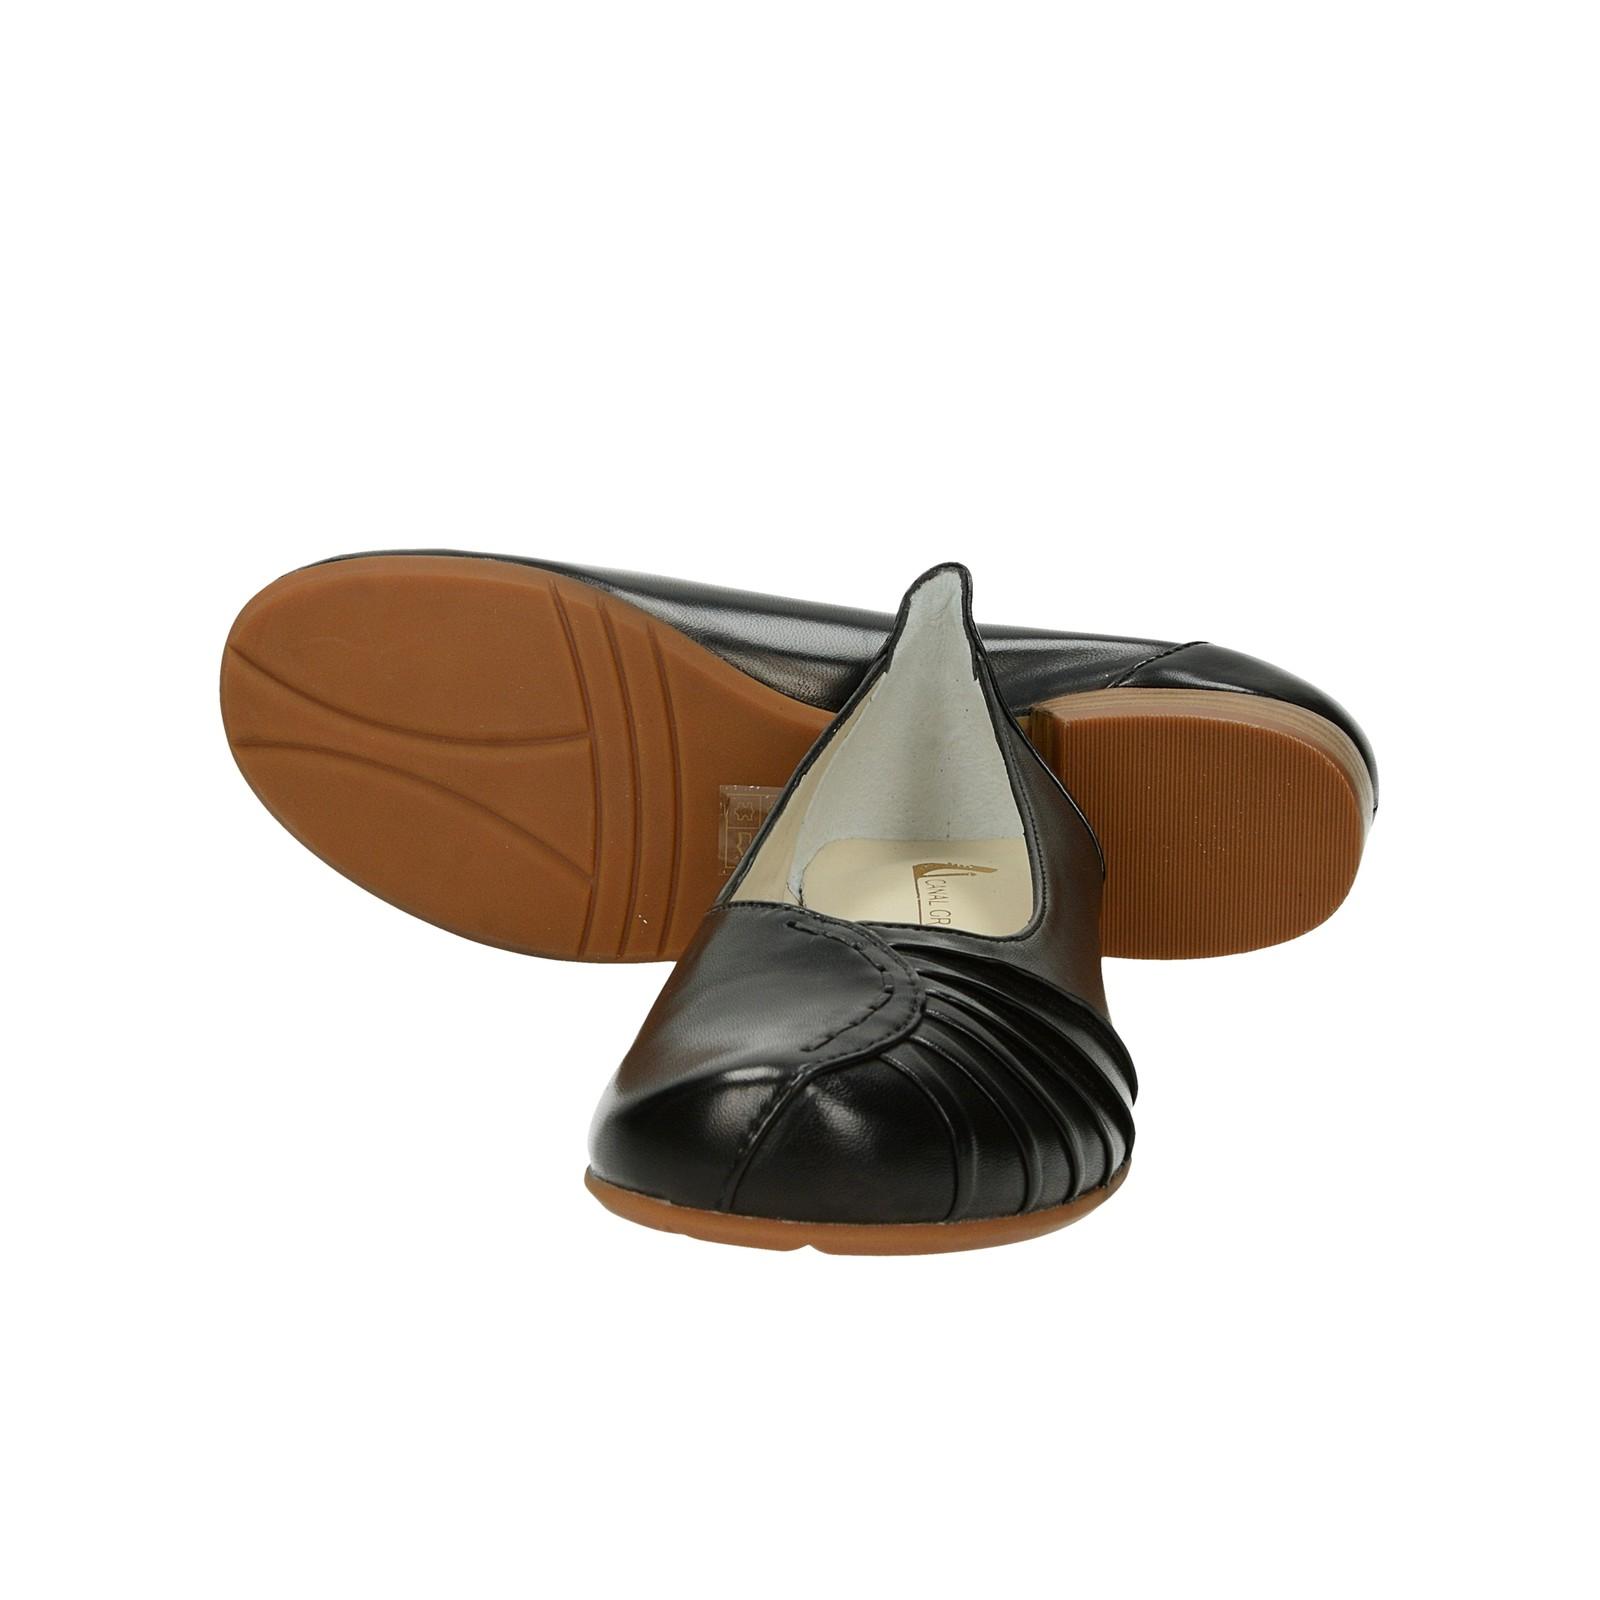 Canal Grande dámske kožené balerínky na podpätku - čierne